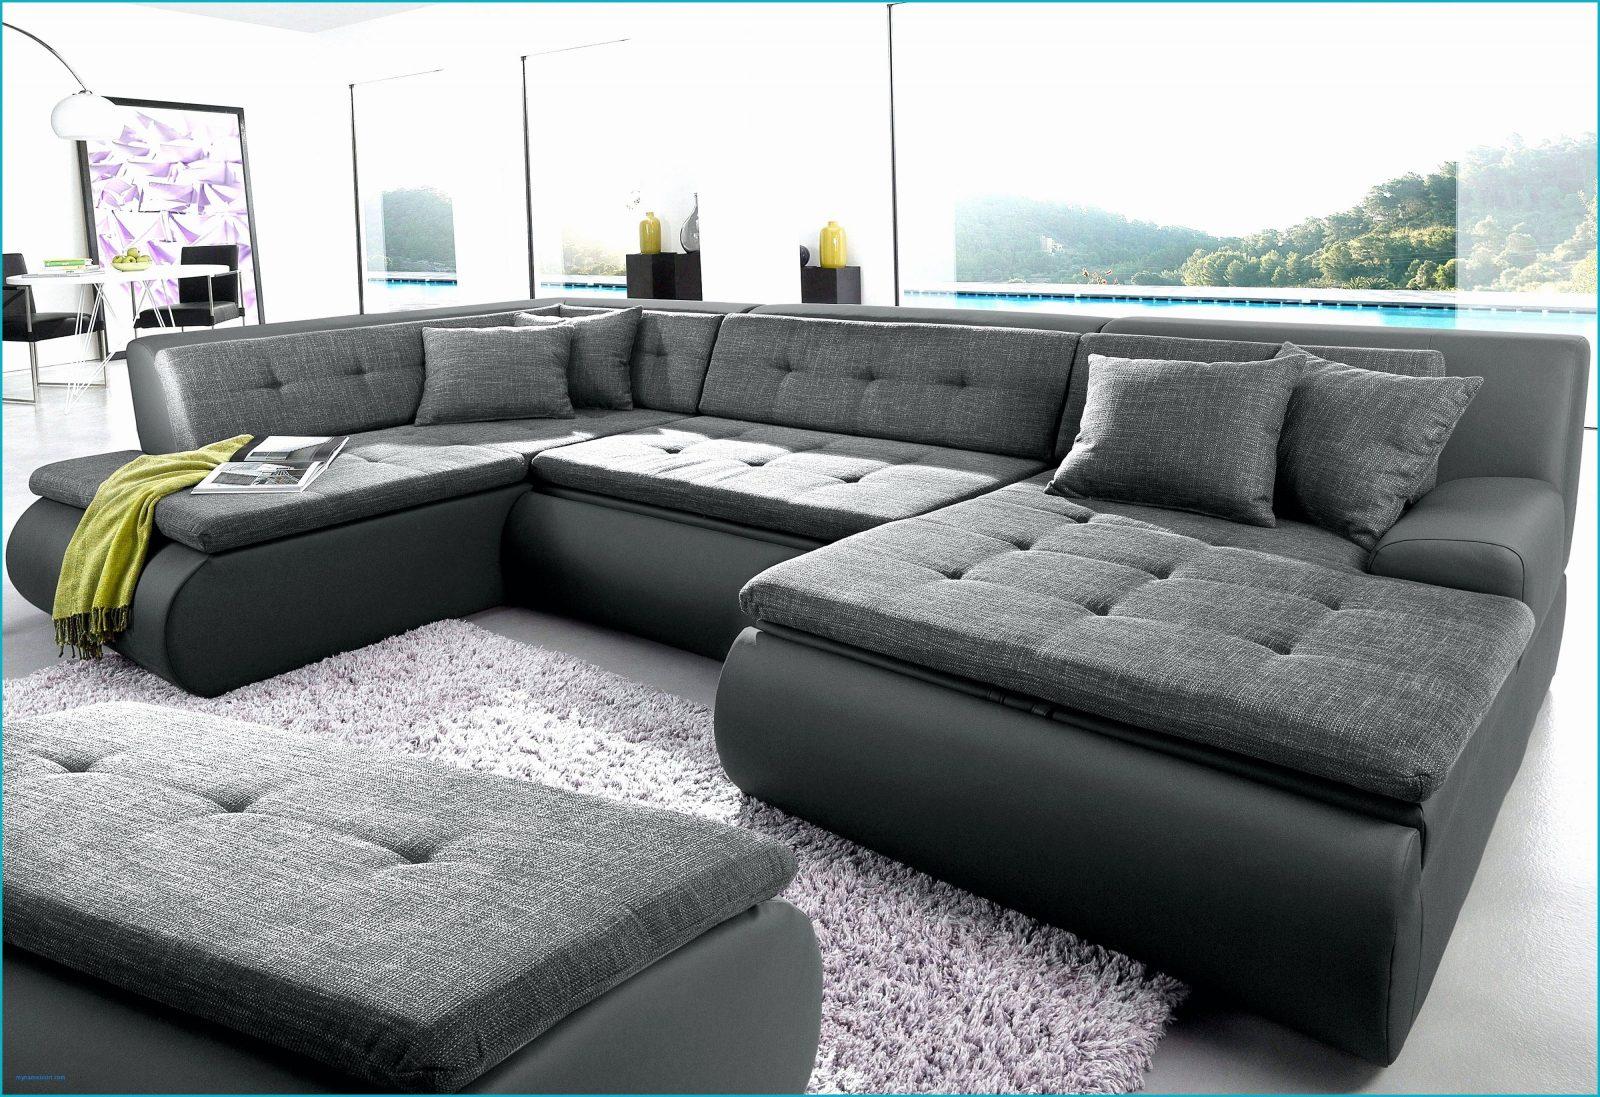 19 Sofa Auf Raten Kaufen Trotz Schufa Inspirierend  Lqaff von Couch Auf Raten Kaufen Trotz Schufa Photo